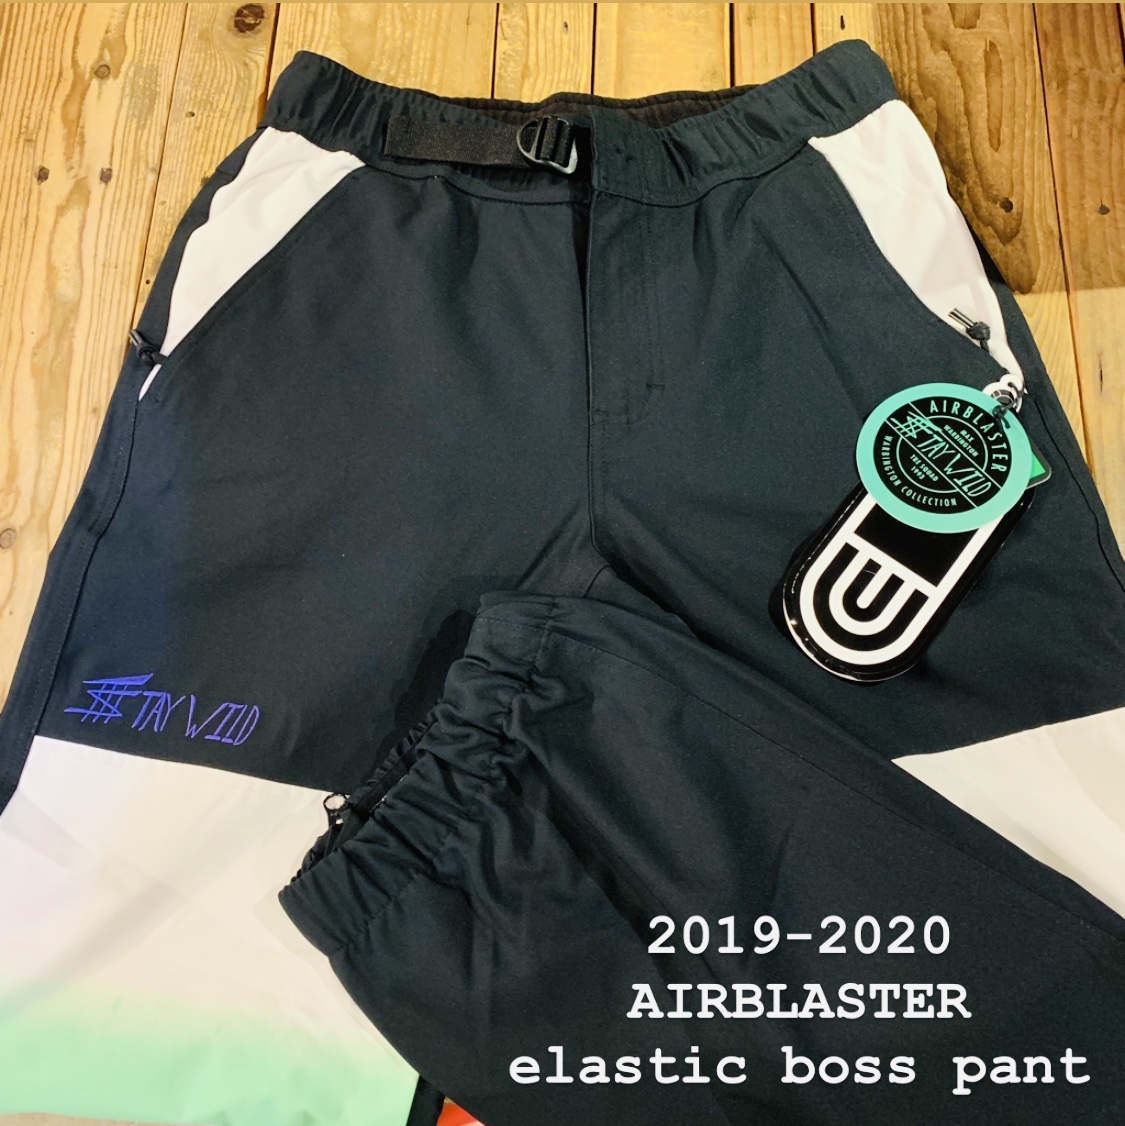 AIRBLASTER_商品01_ELASTIC BOSS PANT